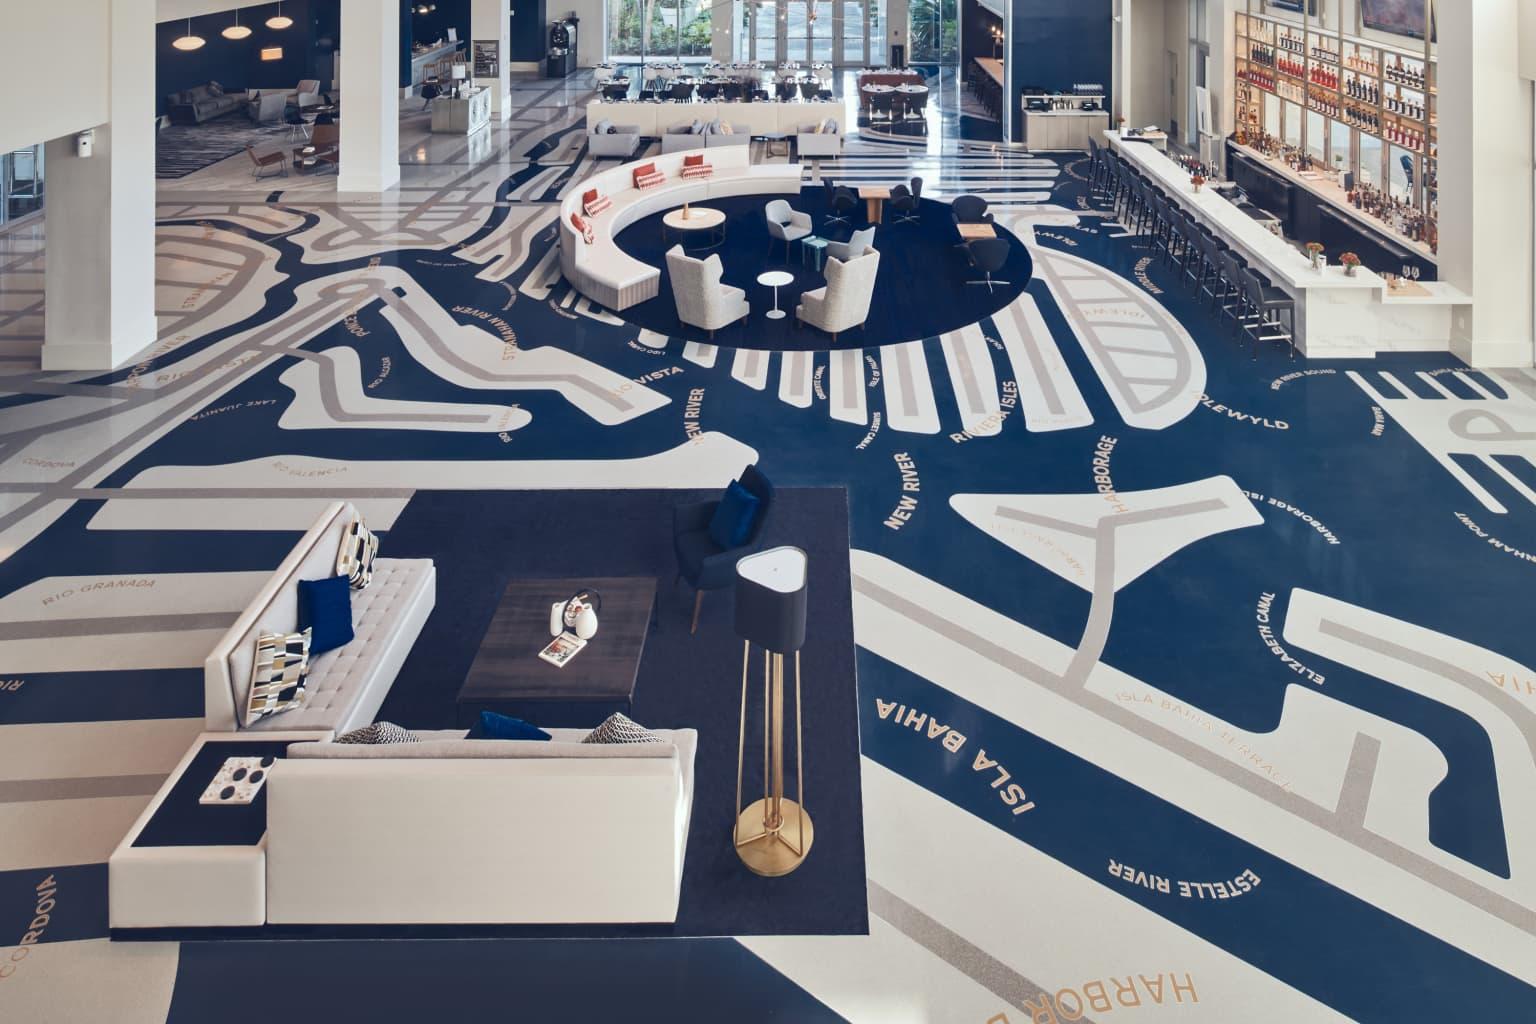 Le Méridien Dania Beach hotel: environmental design / EGD